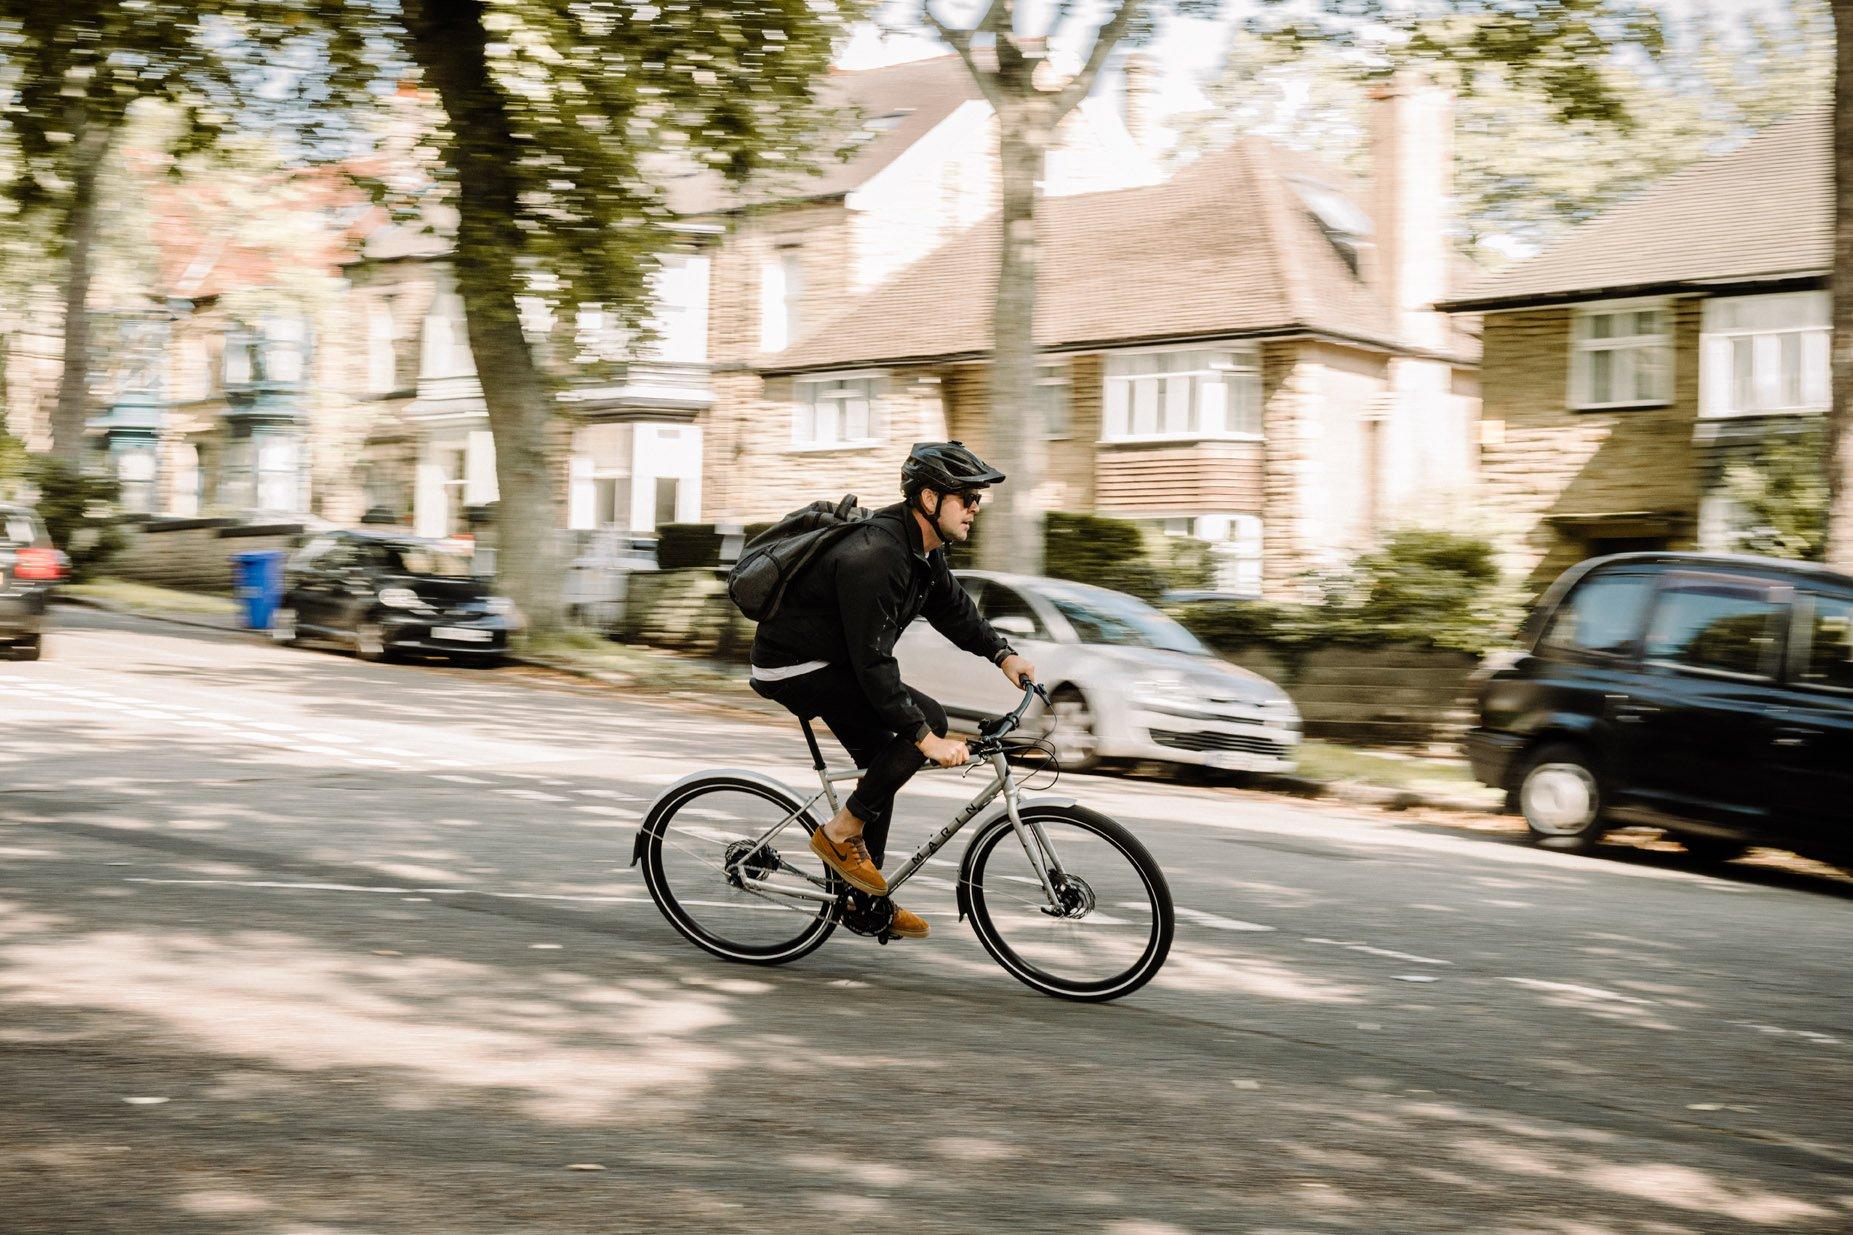 Commutor cyclist riding Goodyear Transit Tour tire